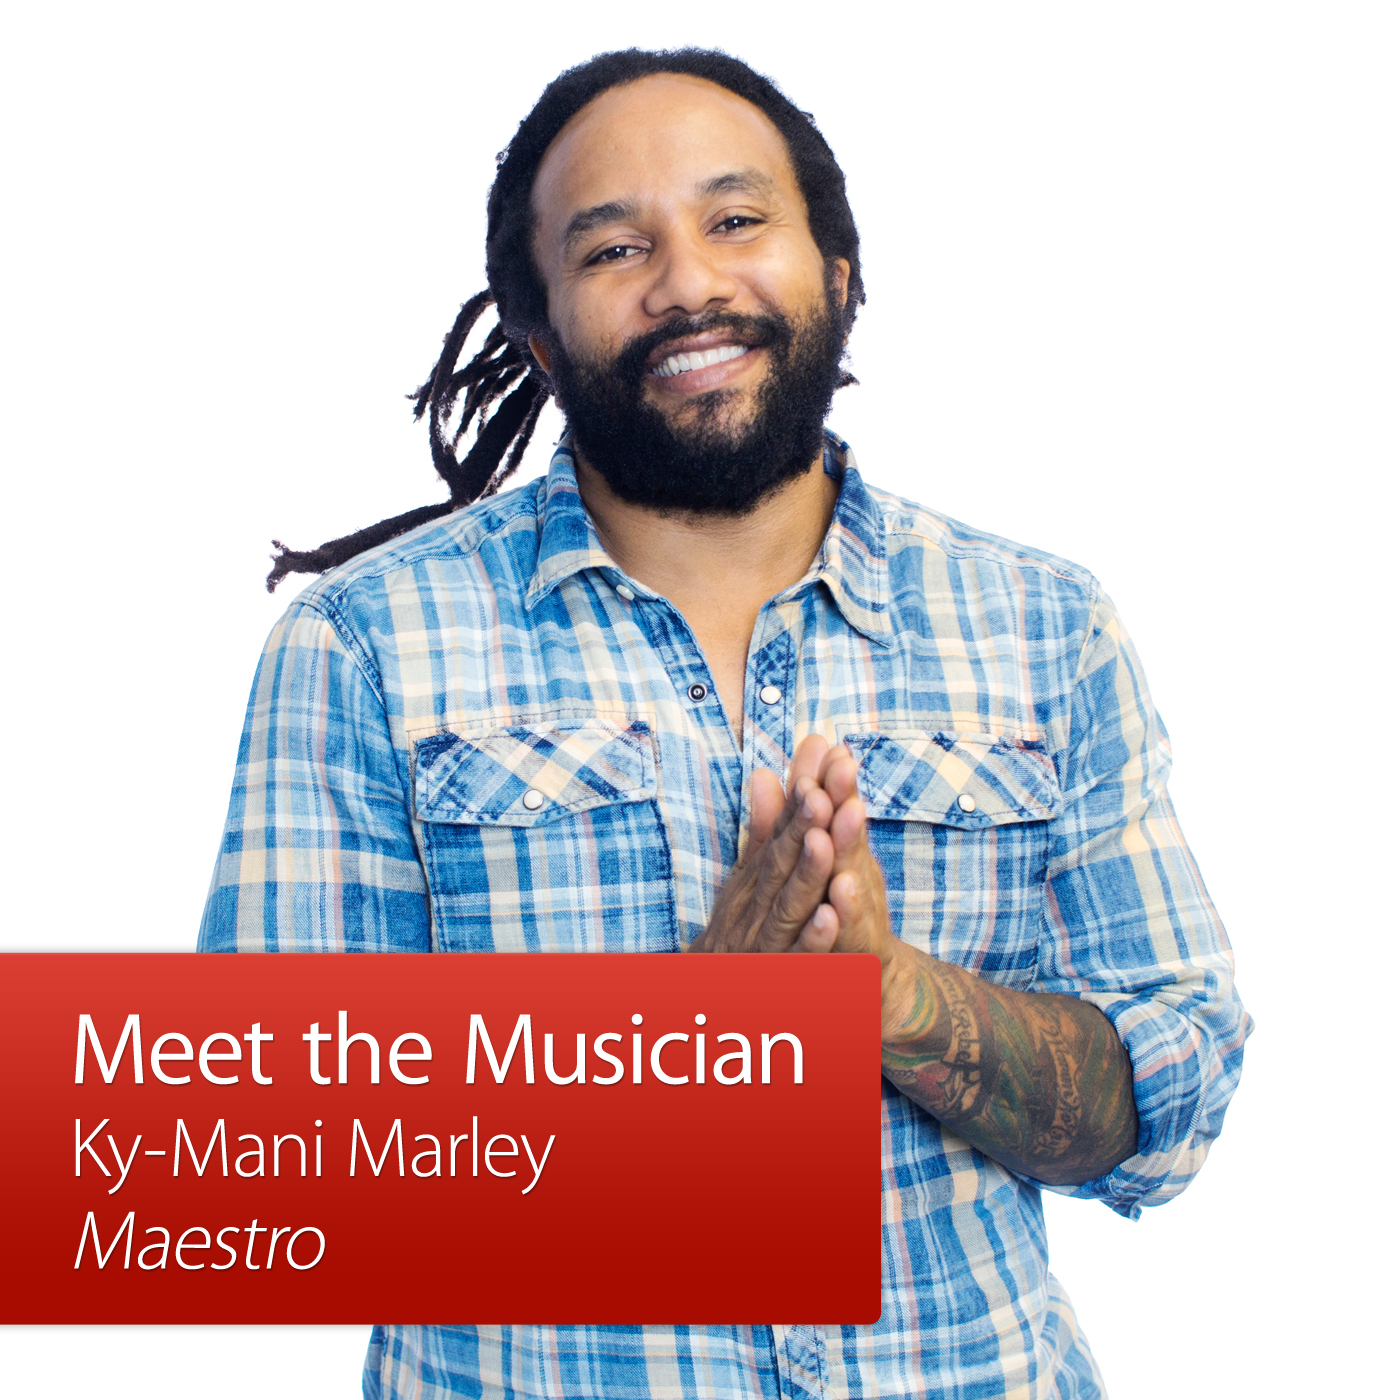 Ky-Mani Marley: Meet the Musician